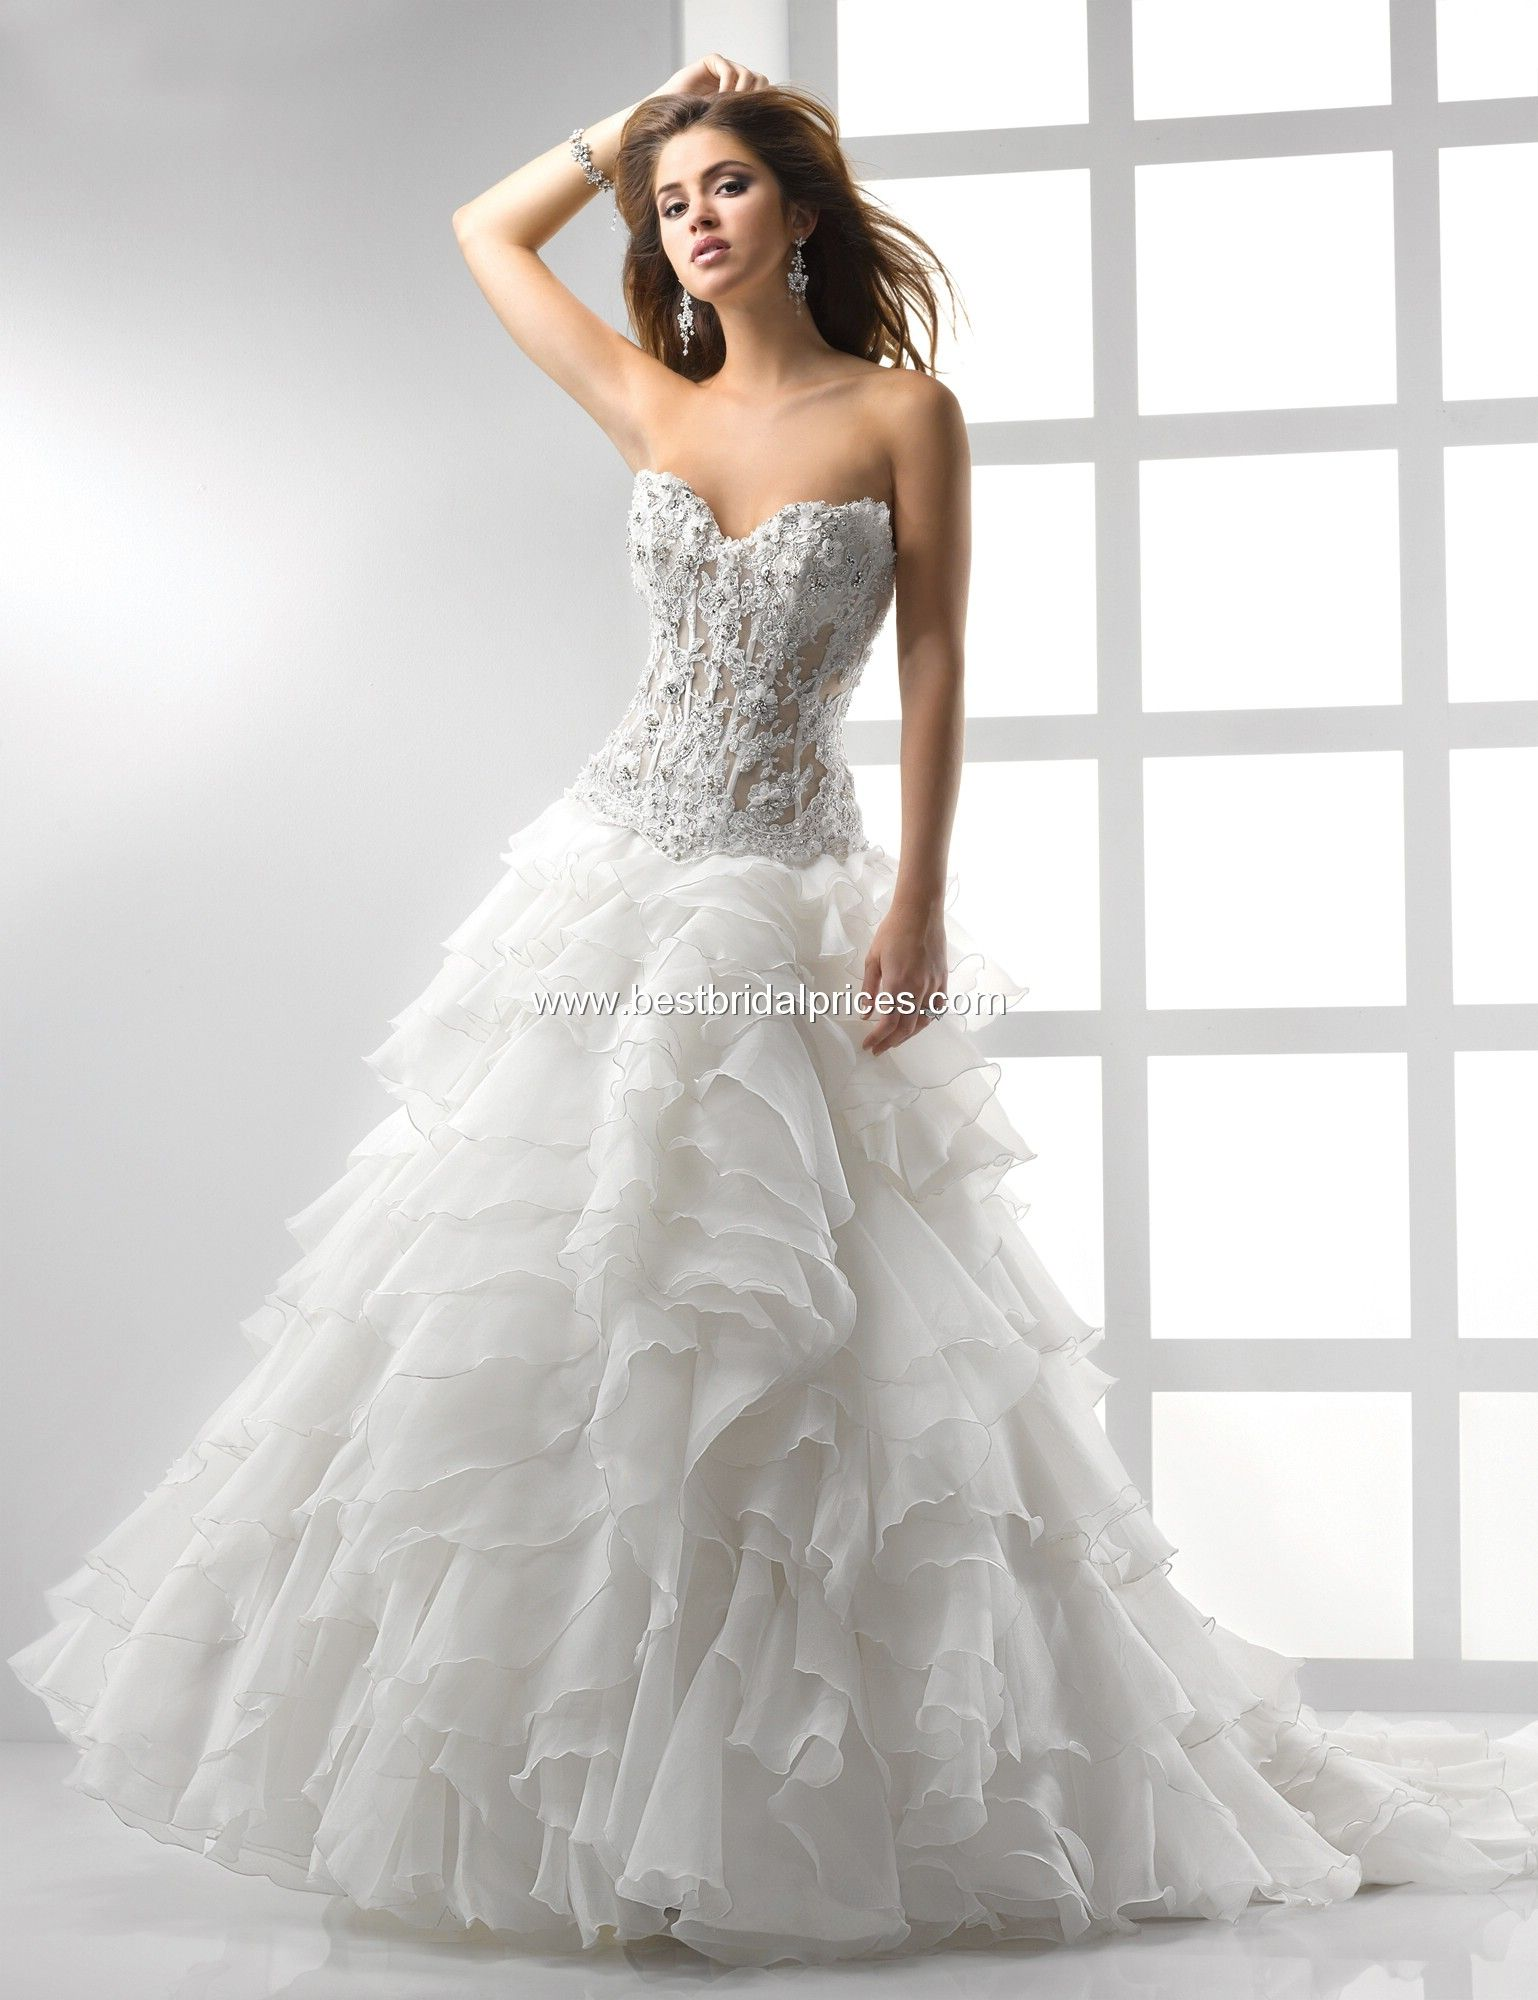 Sottero & Midgley Wedding Dresses - Style Topaz JSM1481 | Weddings ...